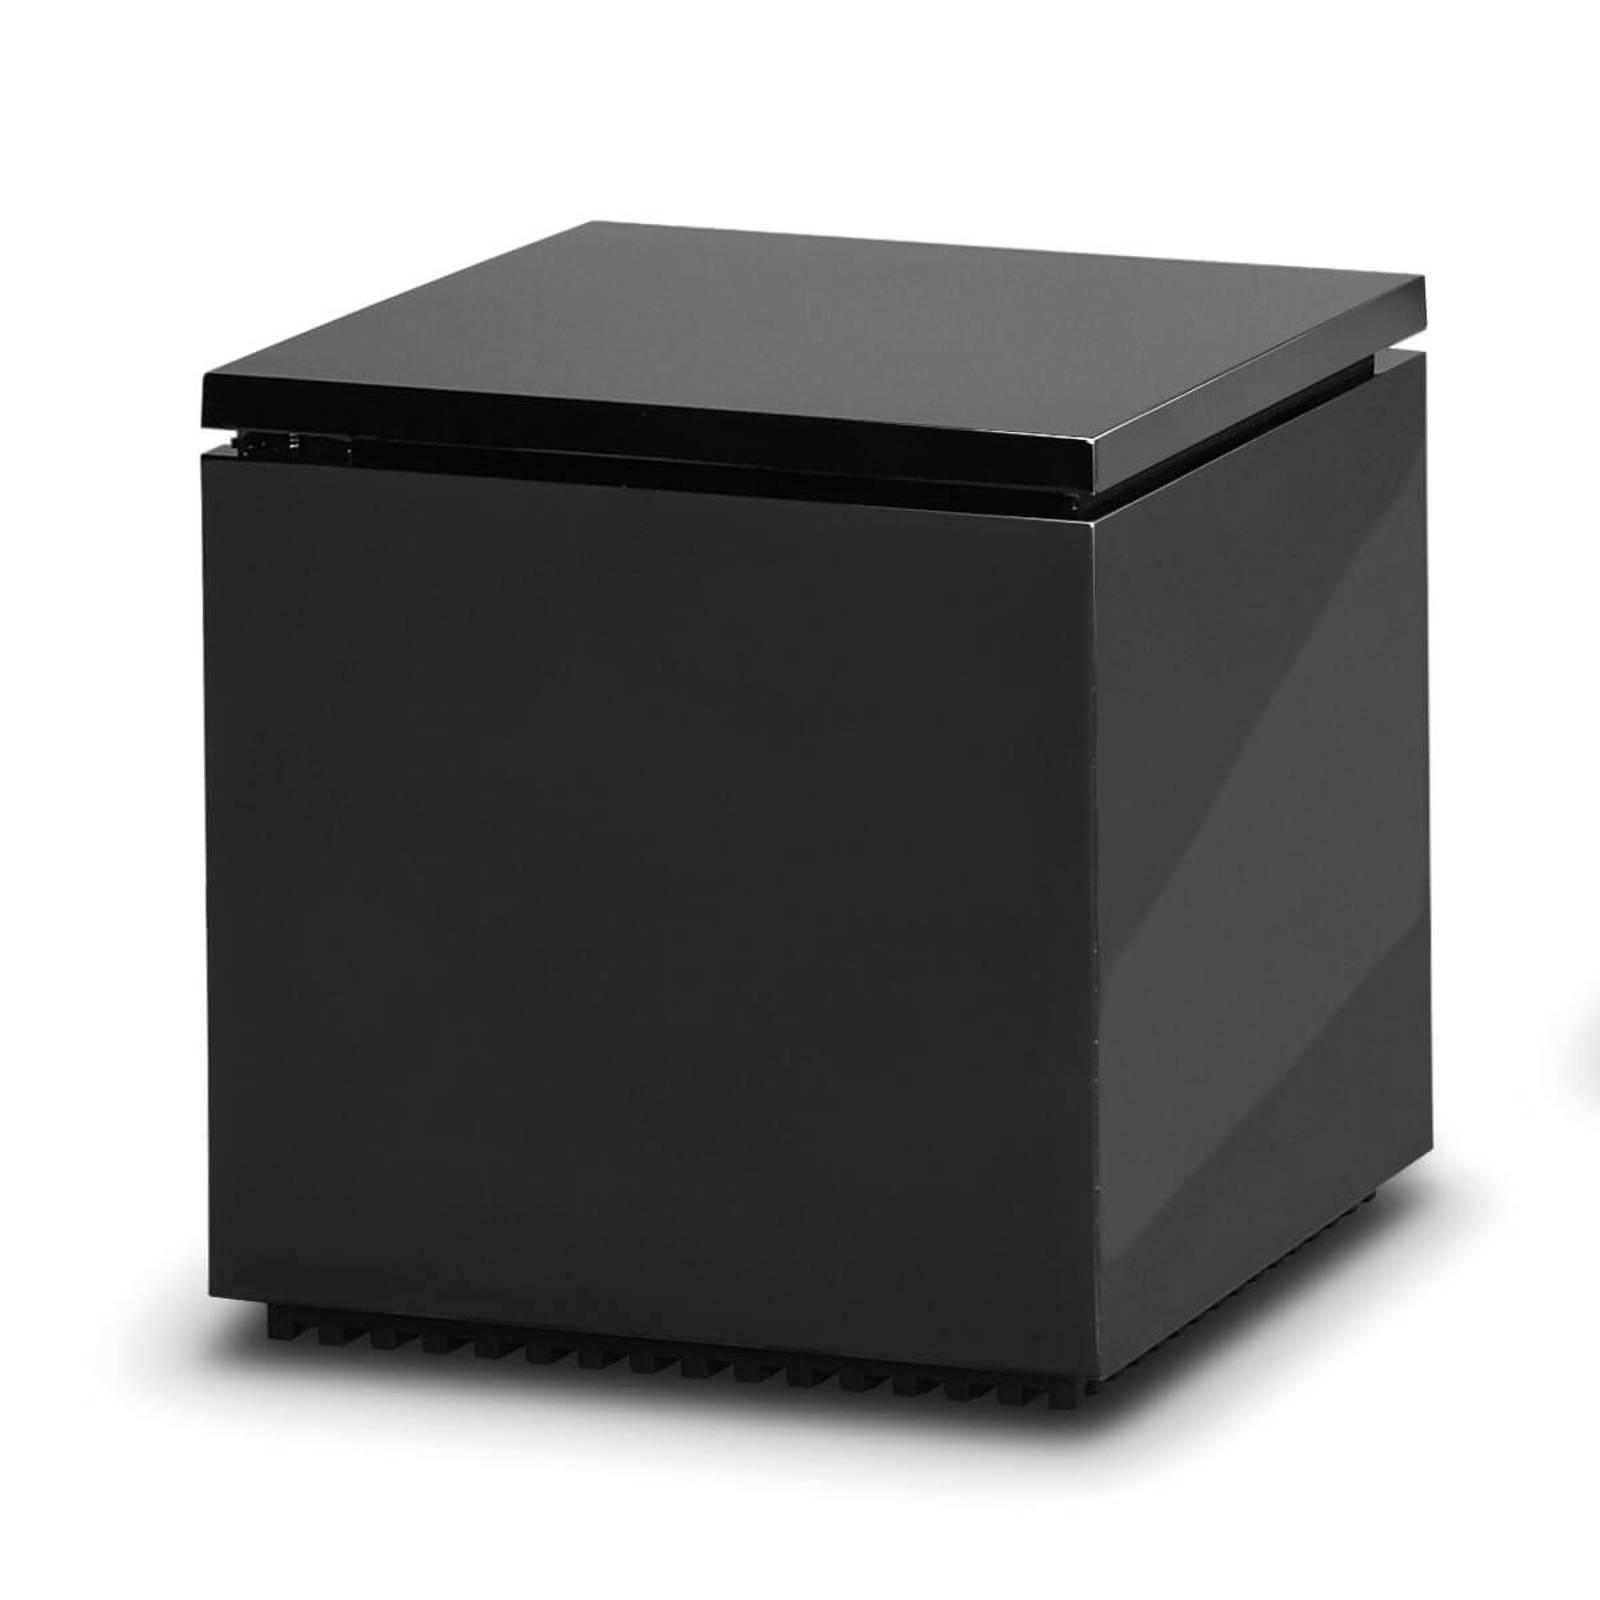 Cini&Nils Cuboled - LED-pöytälamppu, musta